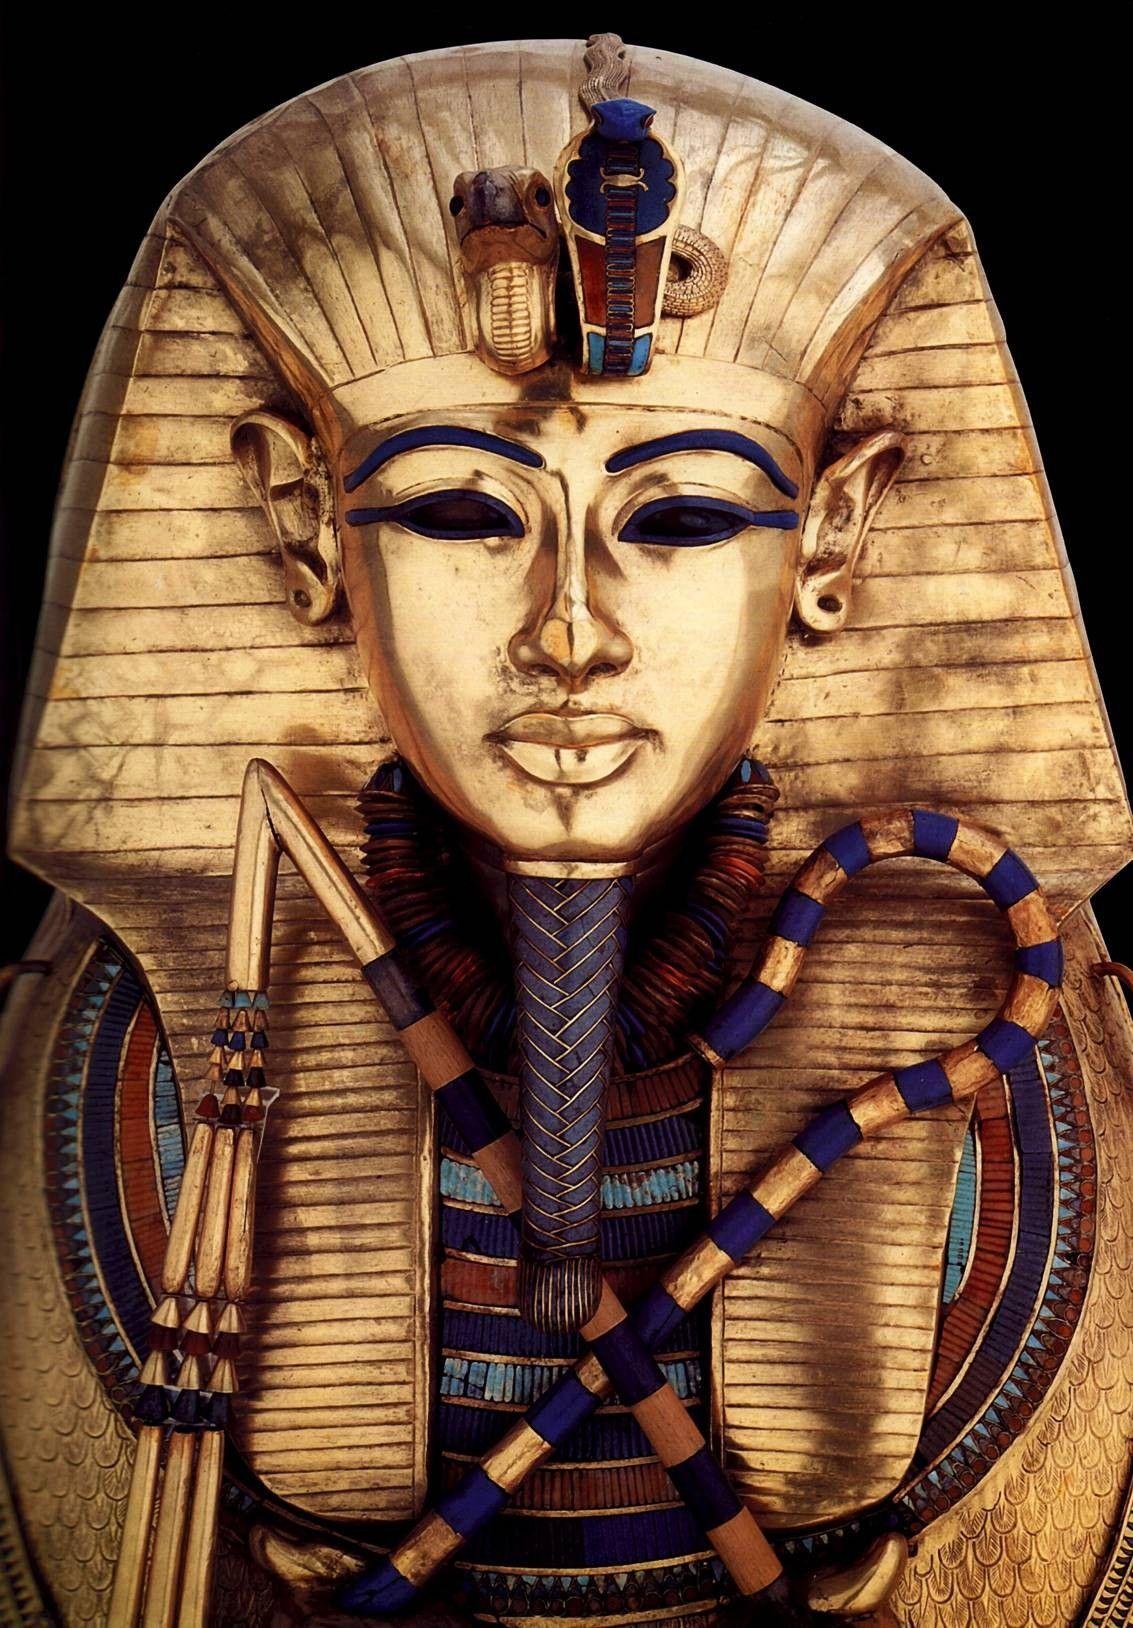 Ancient Egyptian Tarot Images On Pinterest: Egypt, Ancient Egyptian